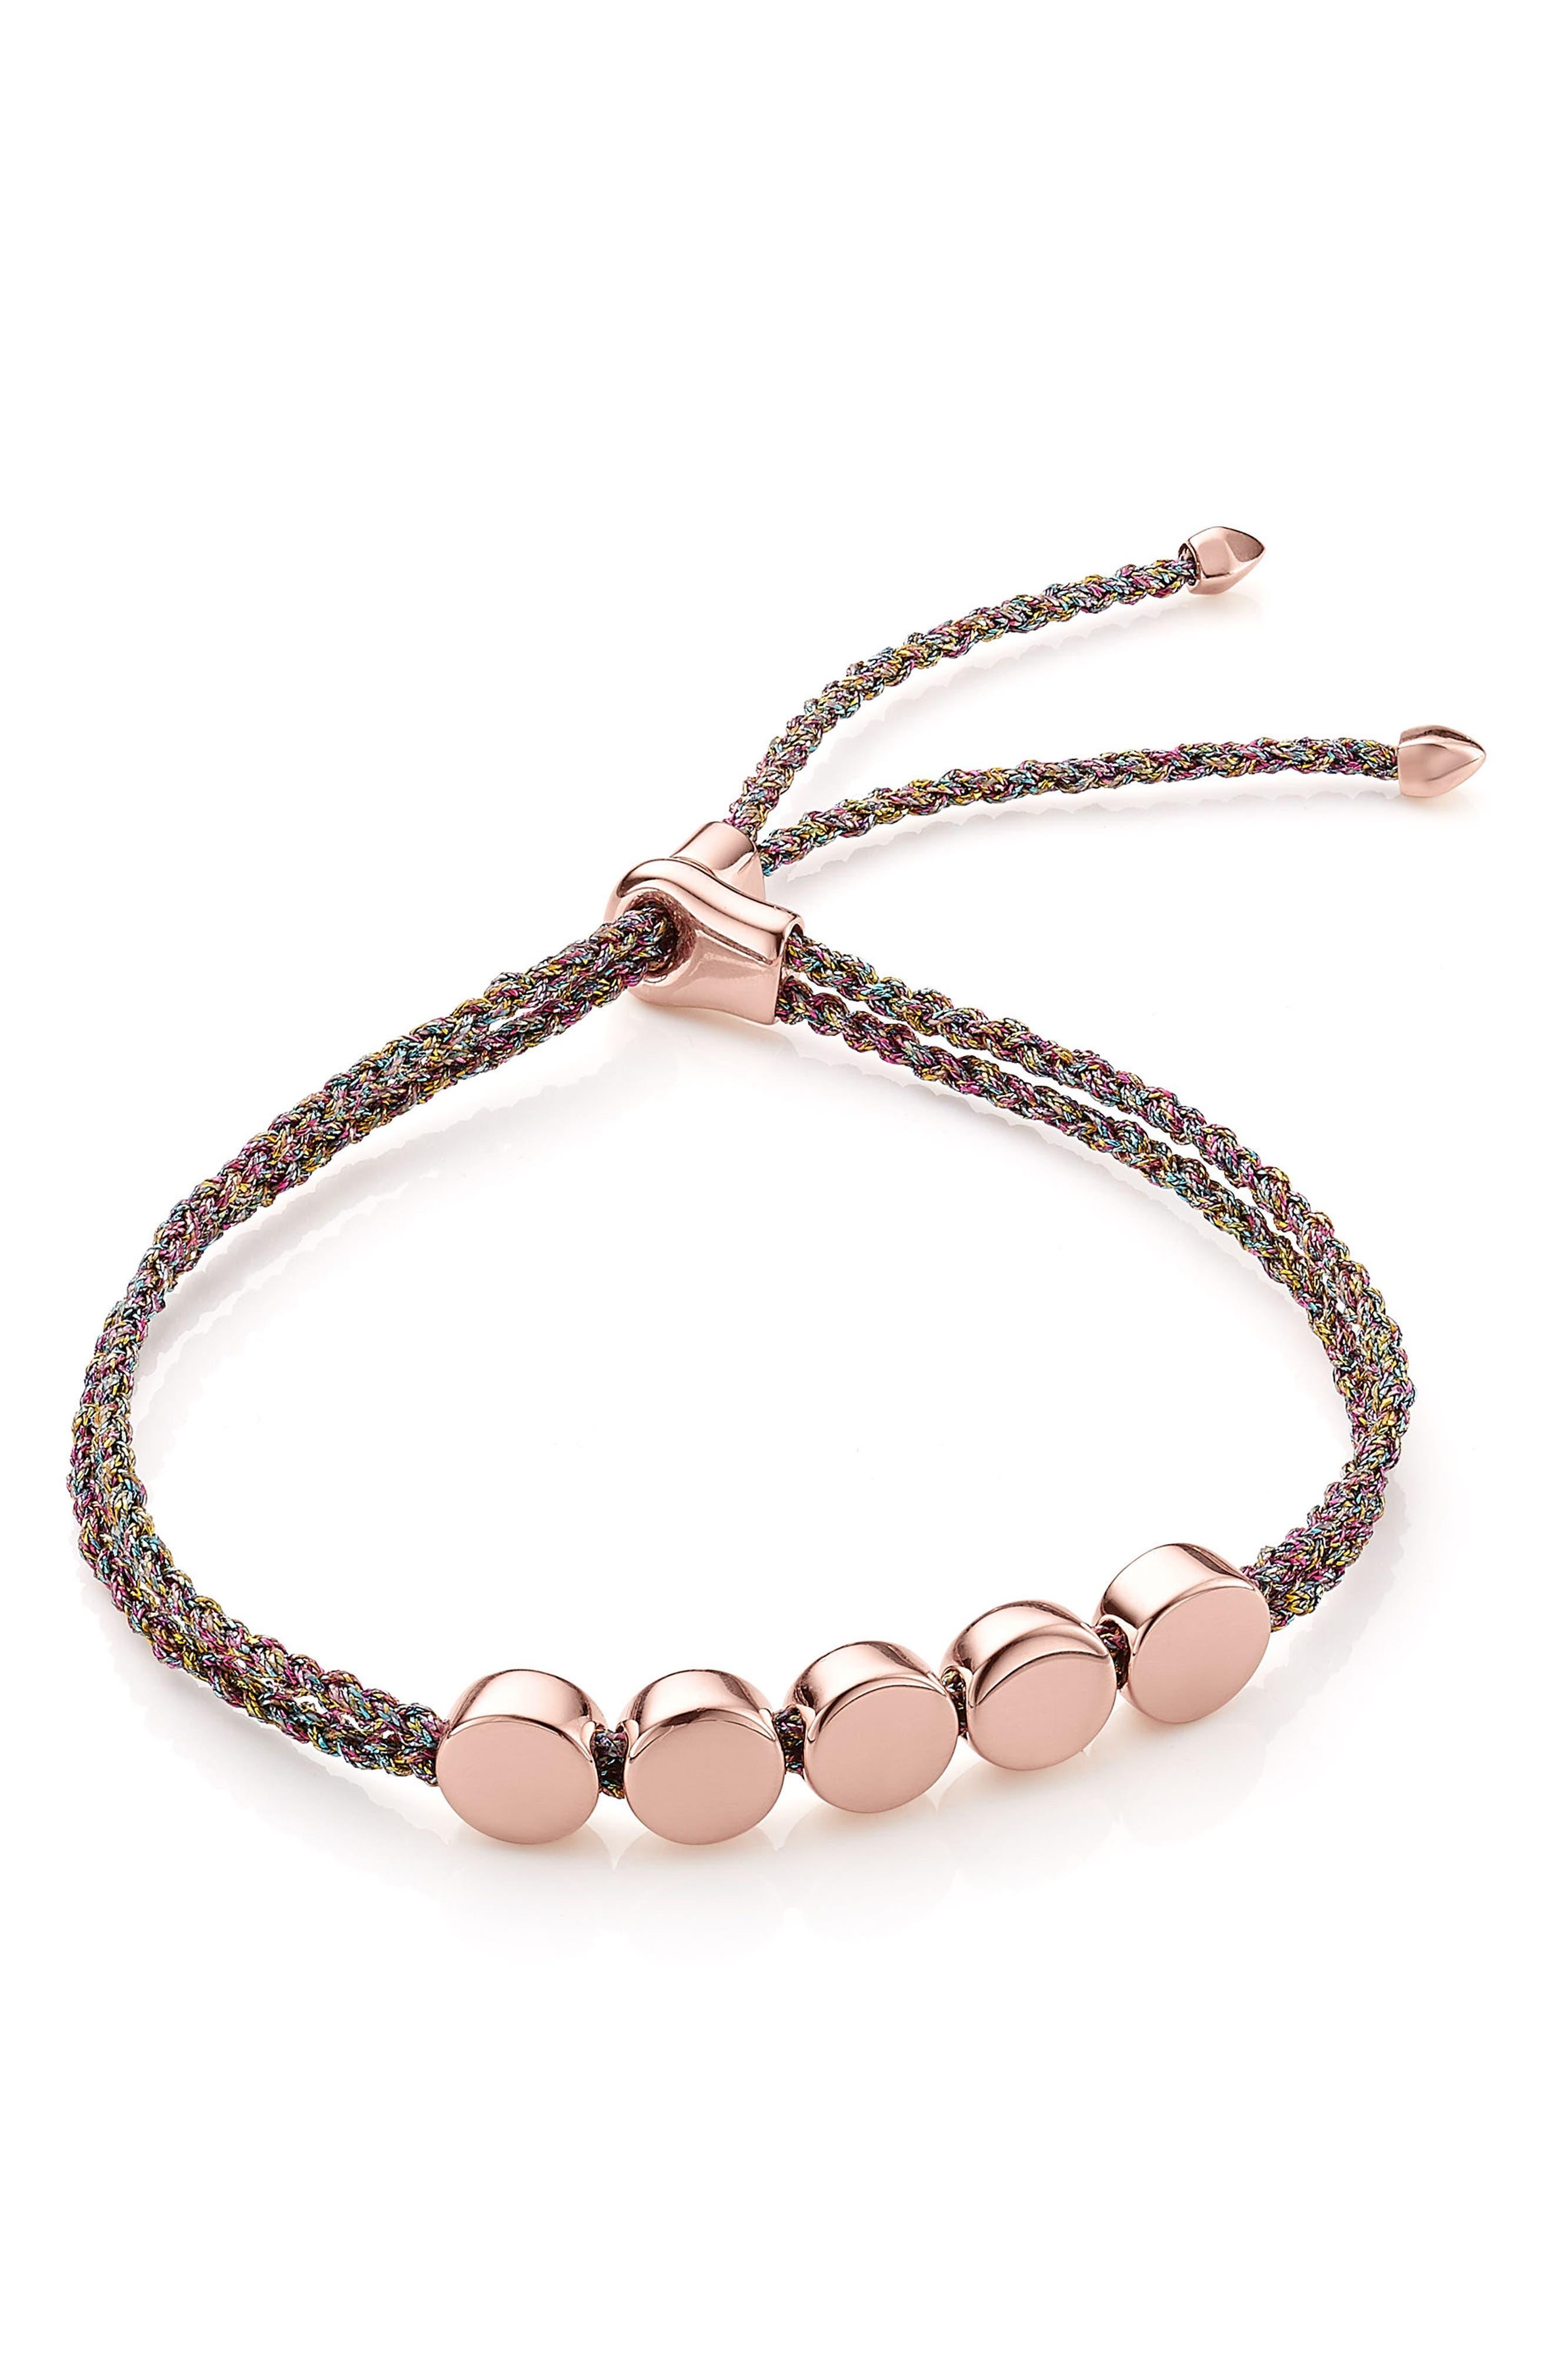 Linear Bead Friendship Bracelet,                             Main thumbnail 1, color,                             Rose Gold/ Rainbow